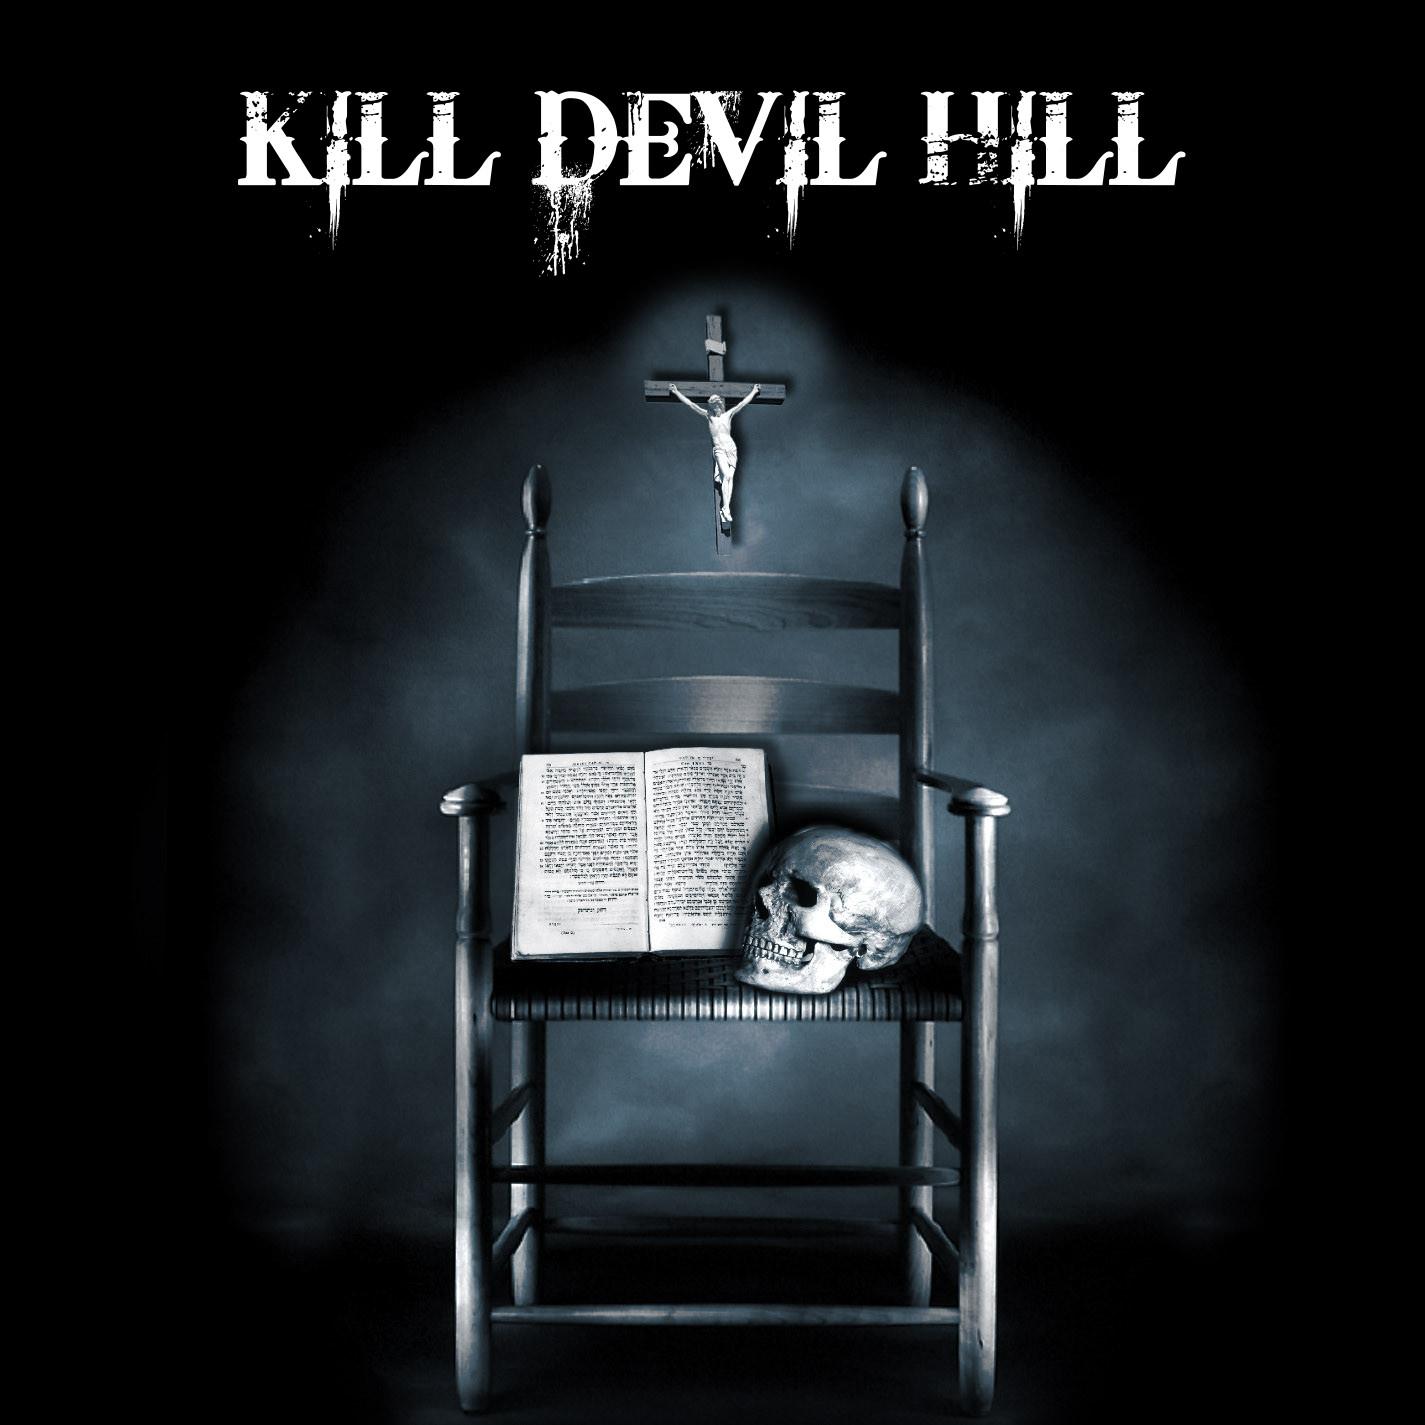 singles in kill devil hills Residential, single family - detached 1615 virginia dare trail kill devil hills, nc  27948 area: kill devil hills oceanside listing price: $2,795,000.